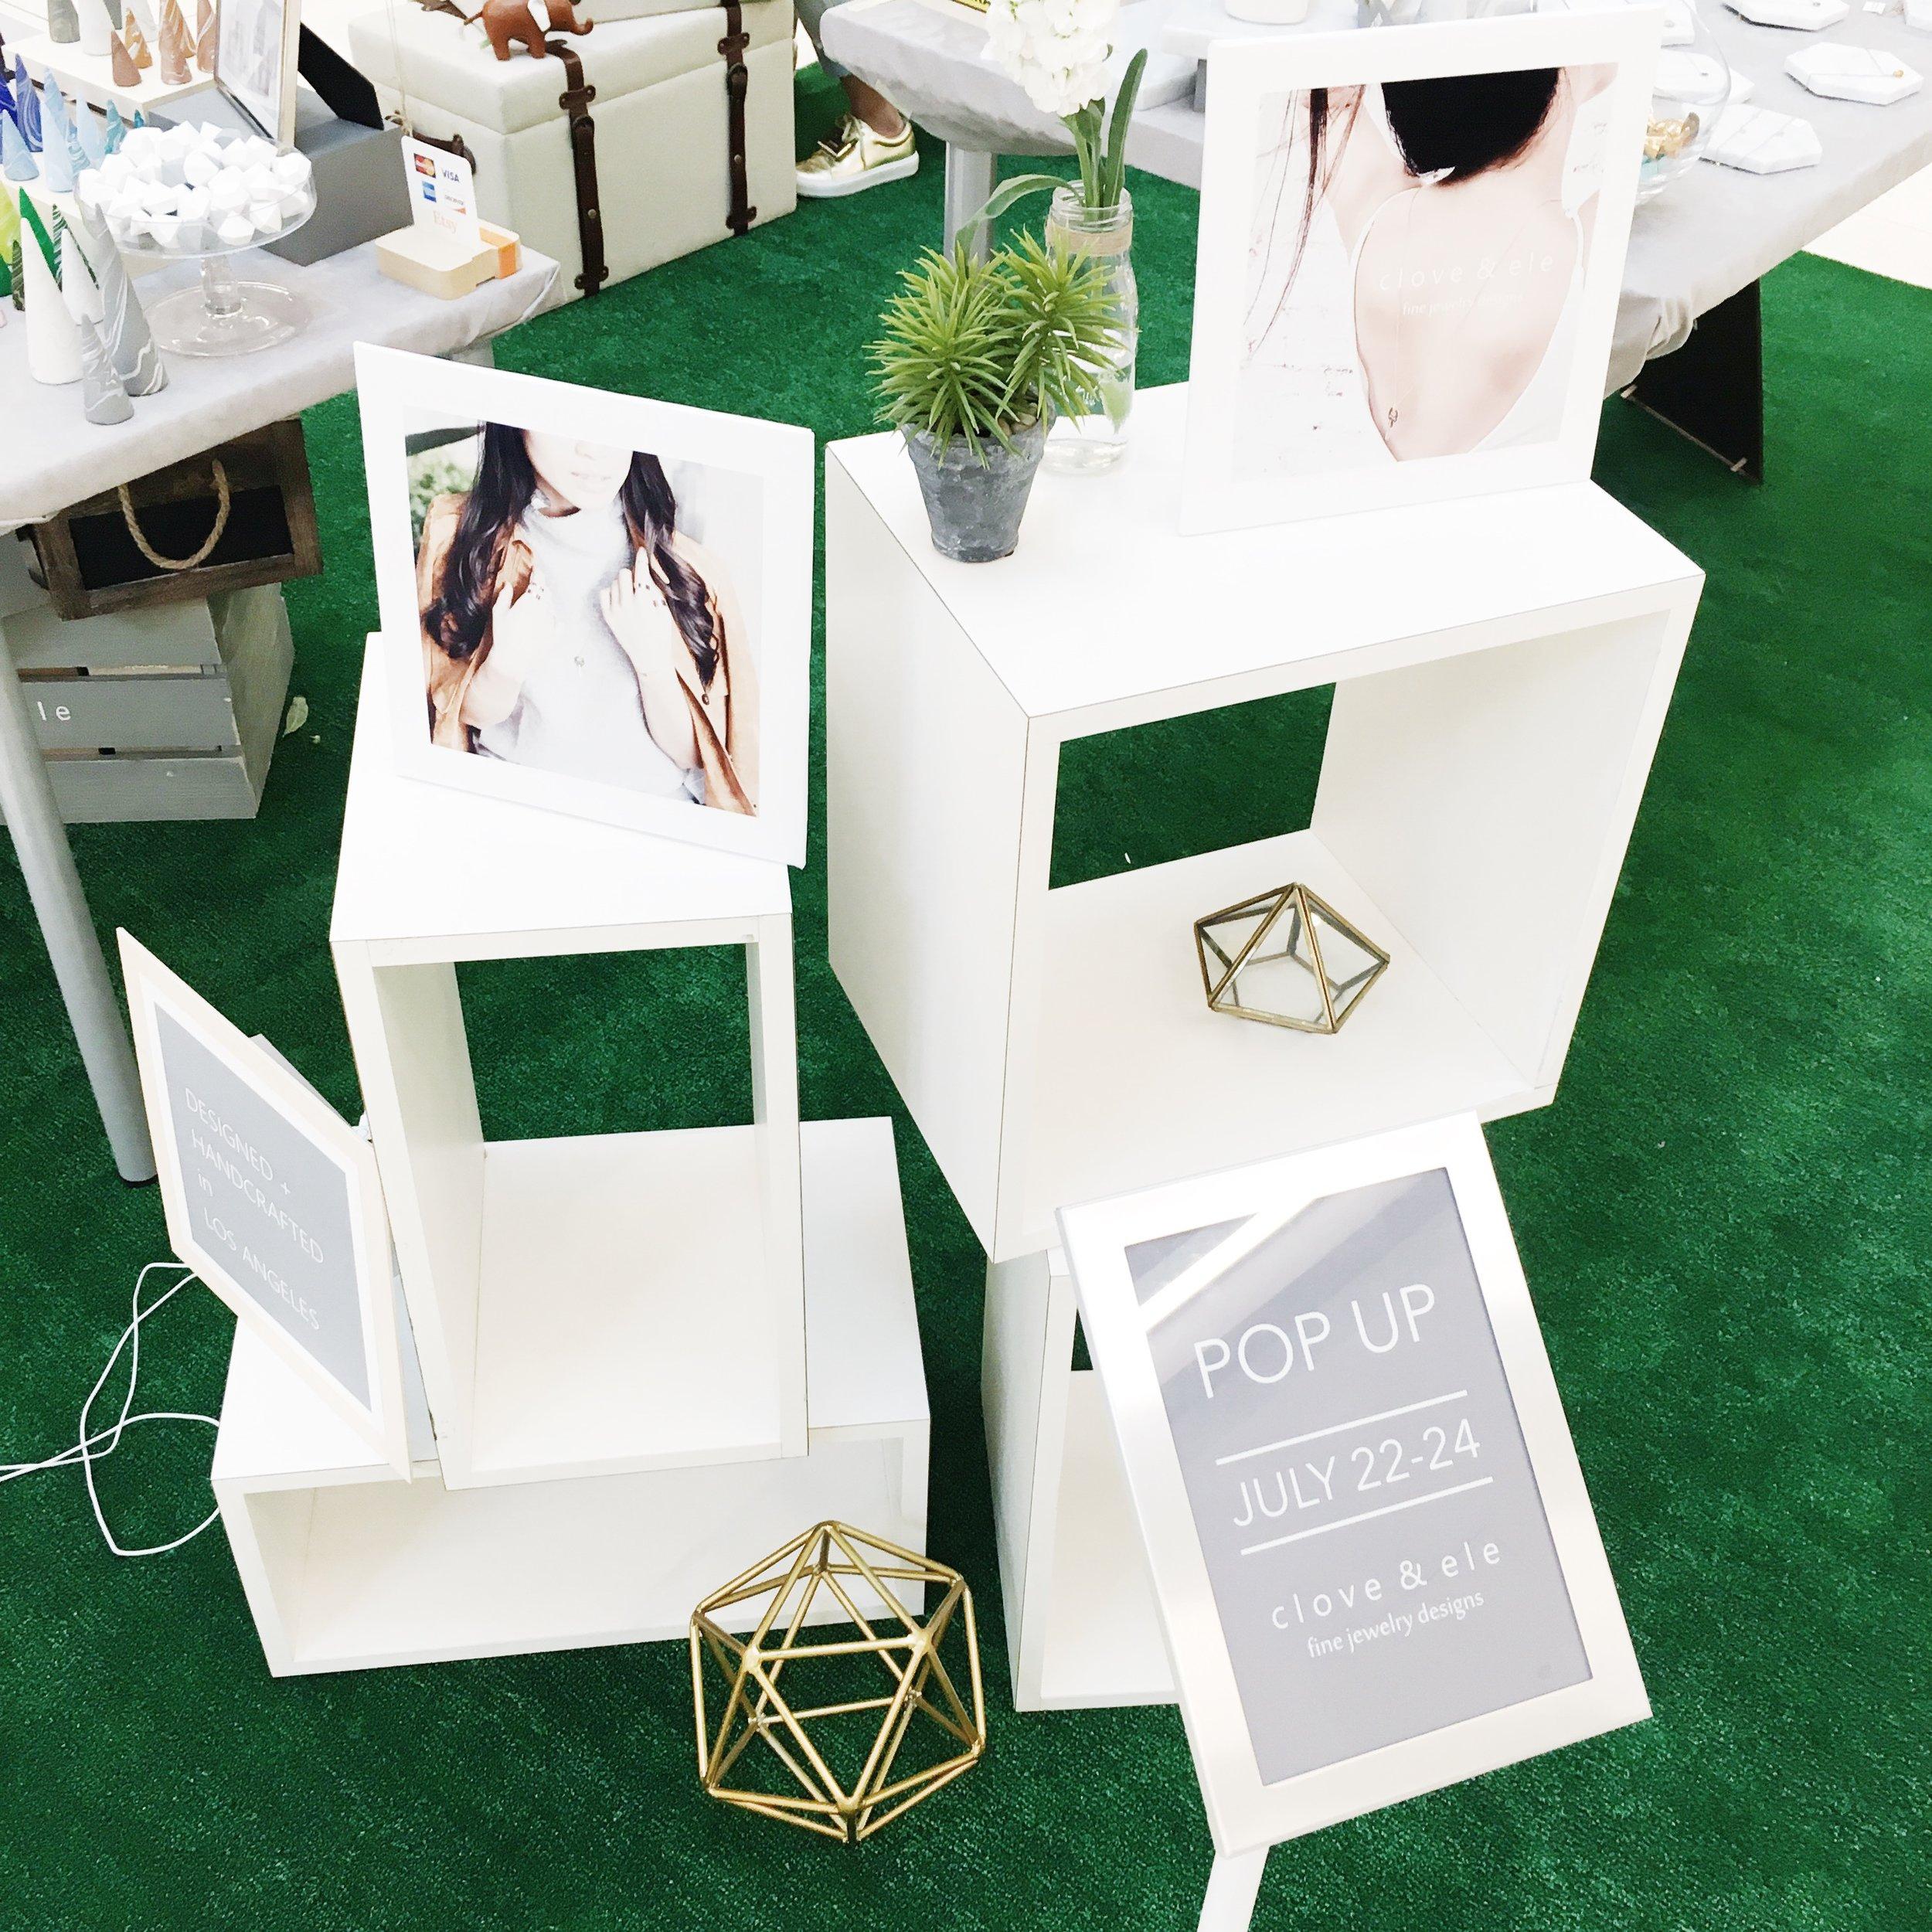 clove and ele fine jewelry designs - westfield - pop up - 3.JPG